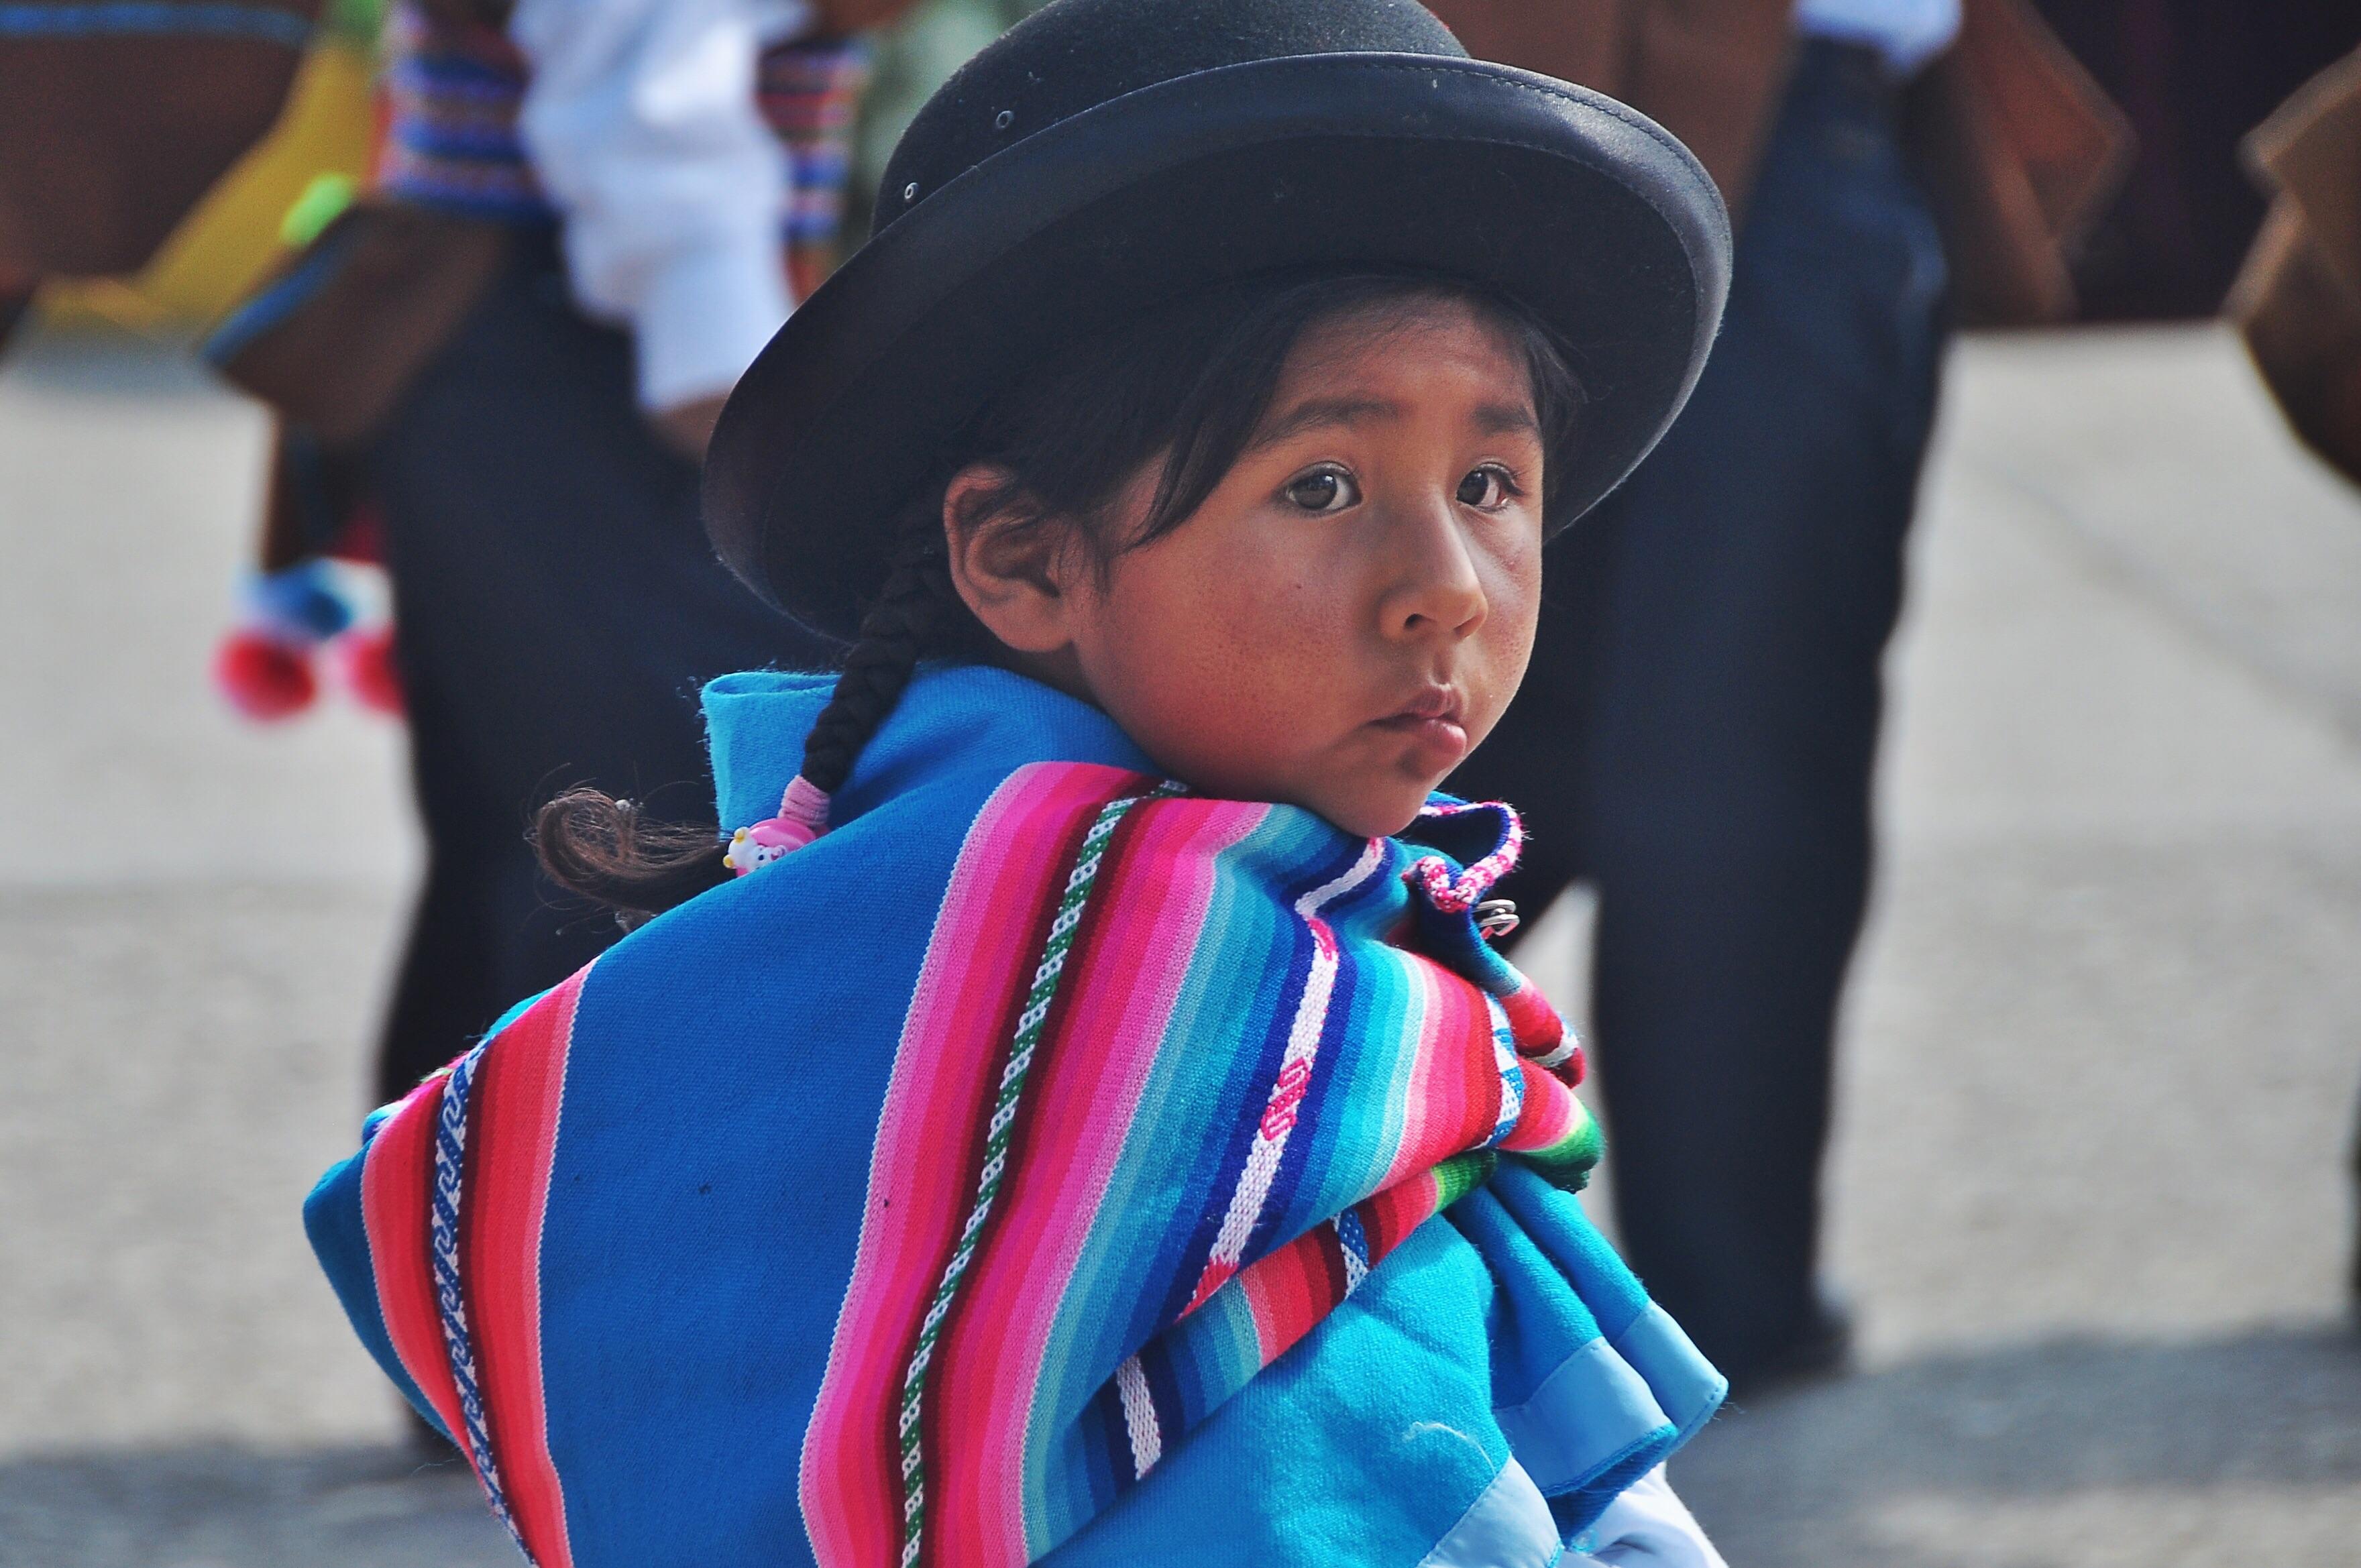 Peru women showing skin right! good